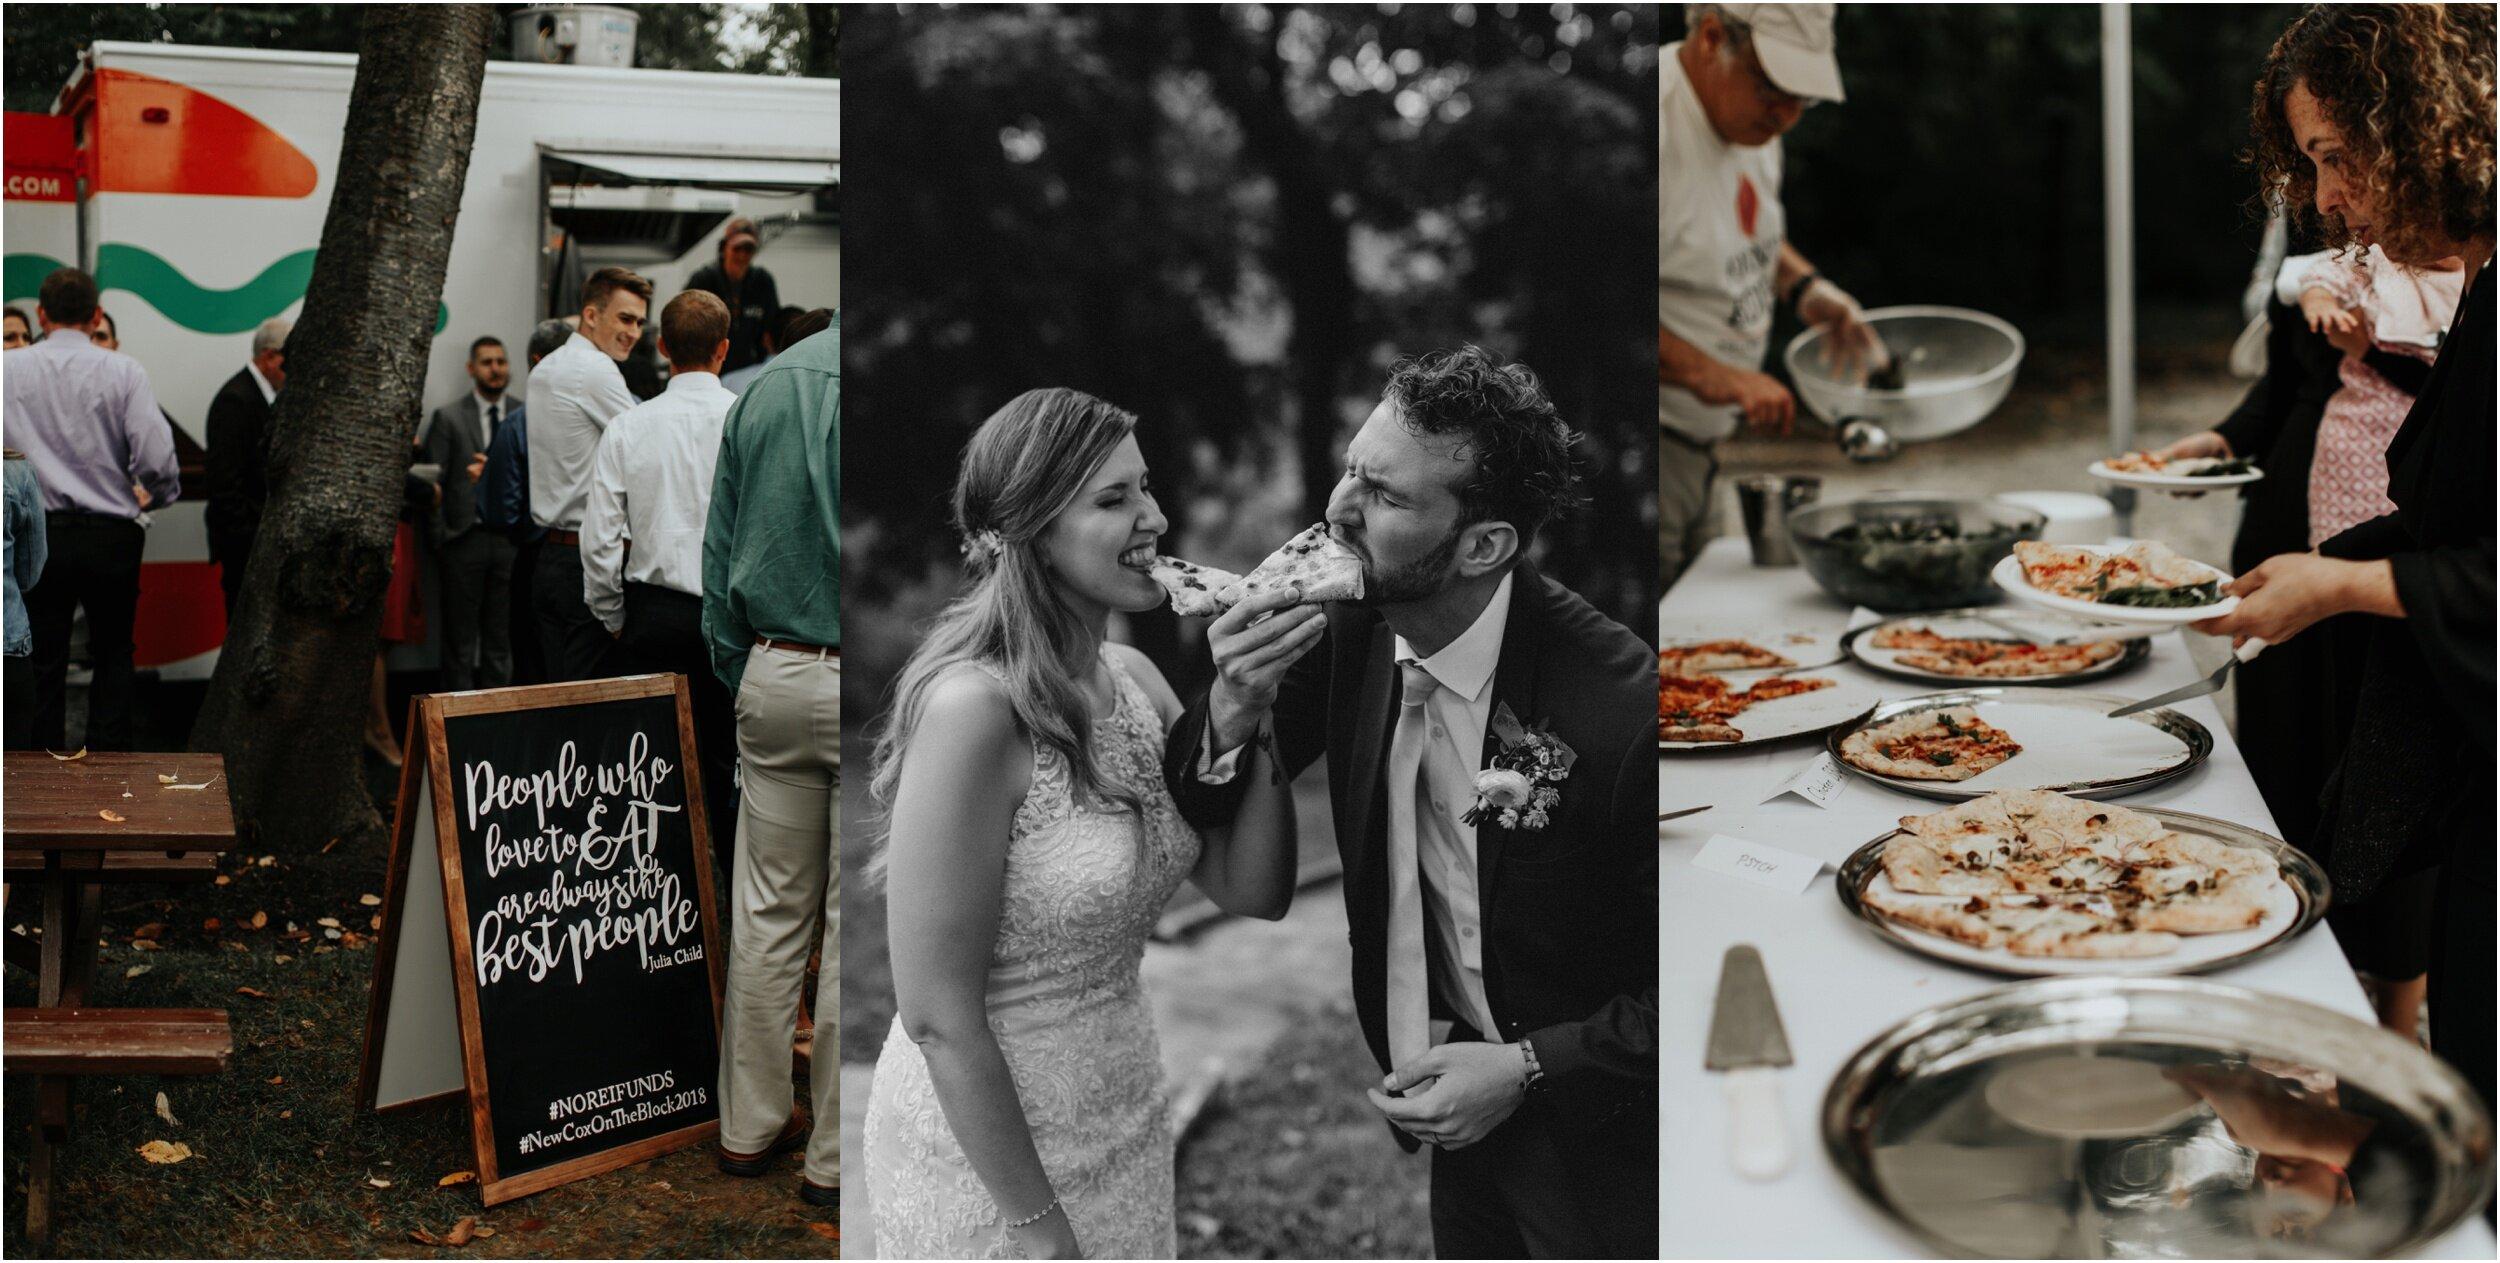 steph-and-jordan-cox-our-wedding-historic-shady-lane-compass-wedding-collective-hazel-lining-photography-destination-elopement-wedding-engagement-photography_0081.jpg